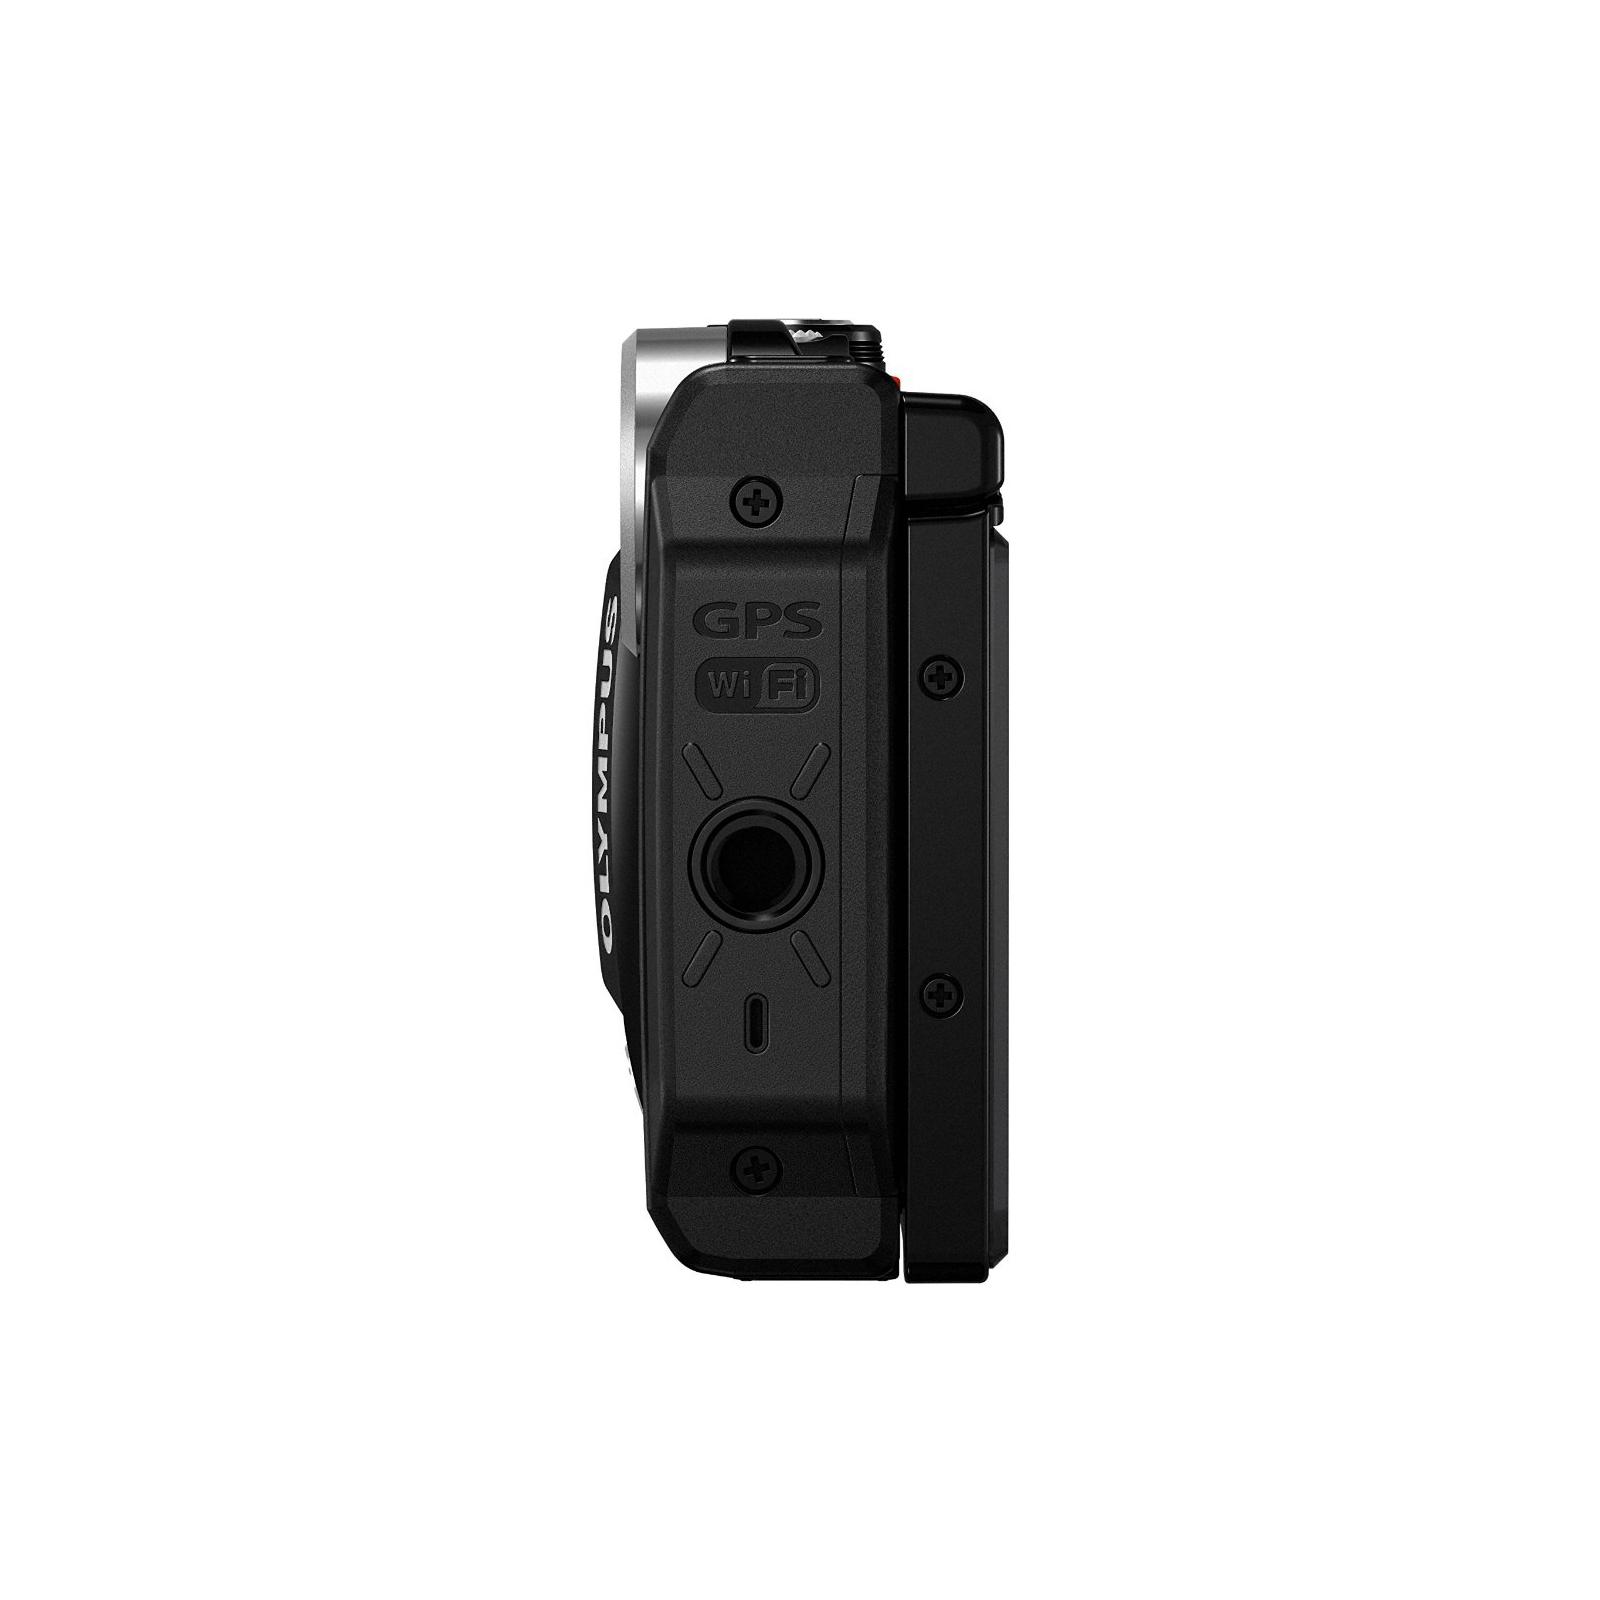 Цифровой фотоаппарат OLYMPUS TG-860 Orange (Waterproof - 15m; iHS; Wi-Fi) (V104170OE000) изображение 9